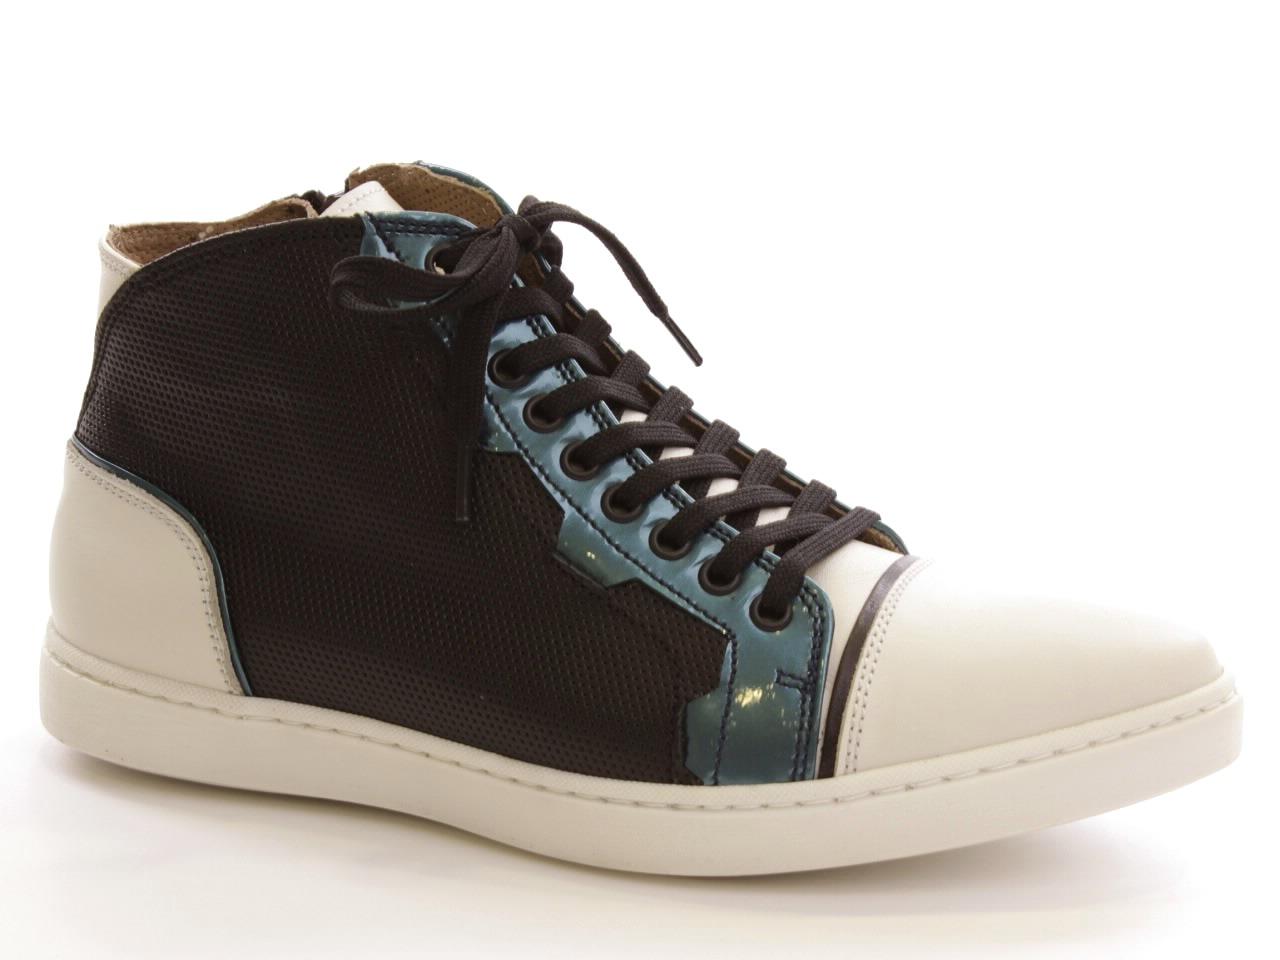 Sneakers and Espadrilles Cohibas - 182 CS0278